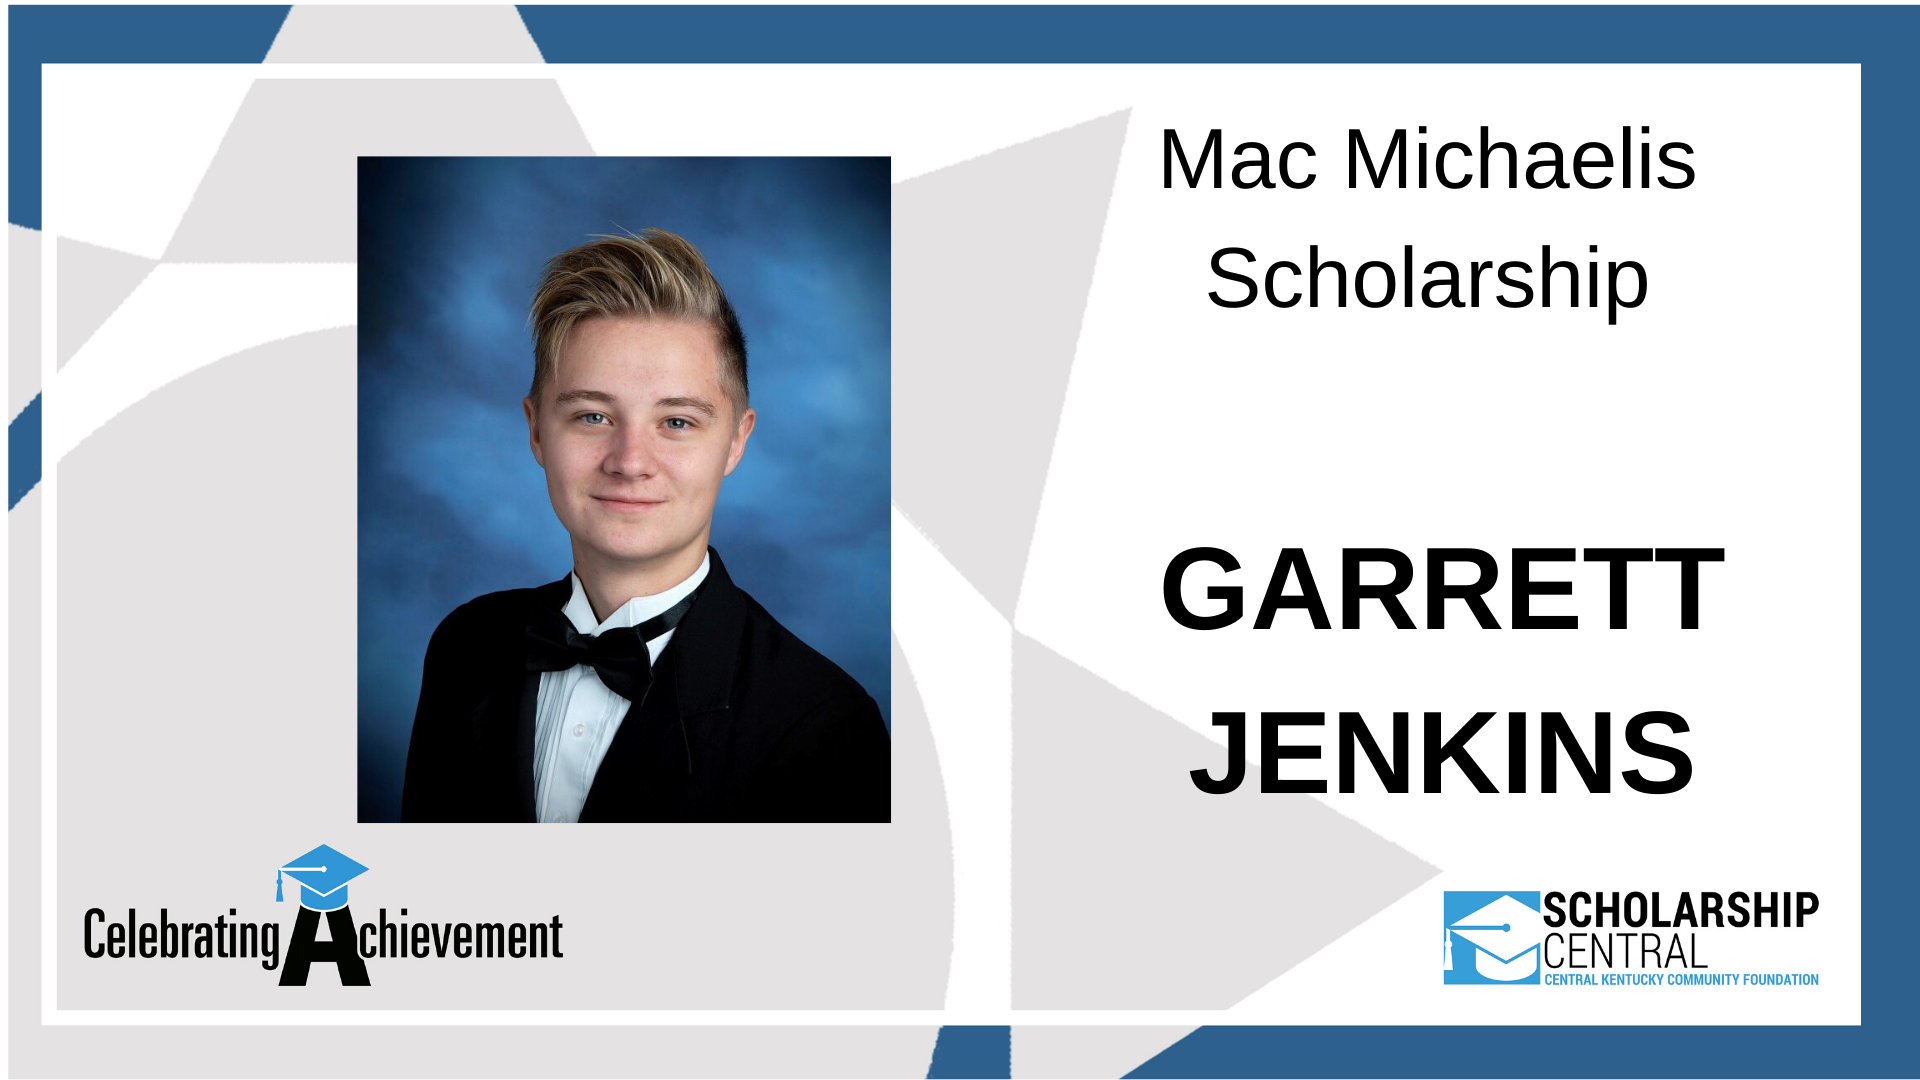 Mac Michaelis Scholarship